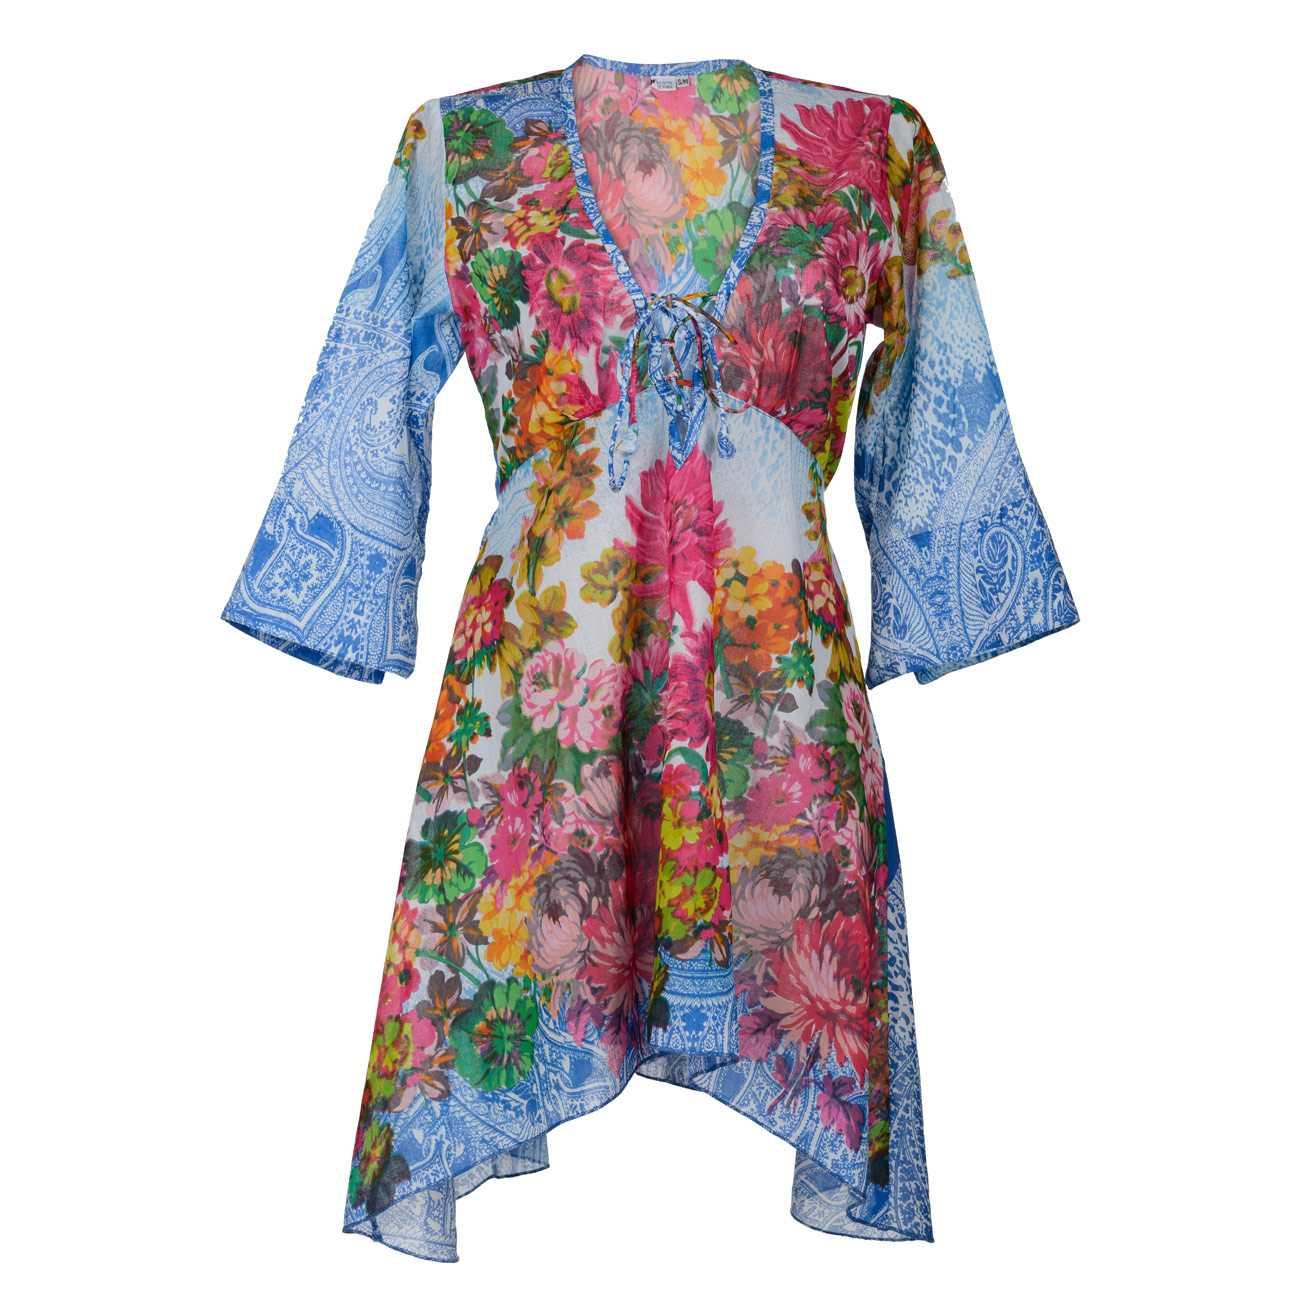 Beach Dress Anais Blue S/M imagine